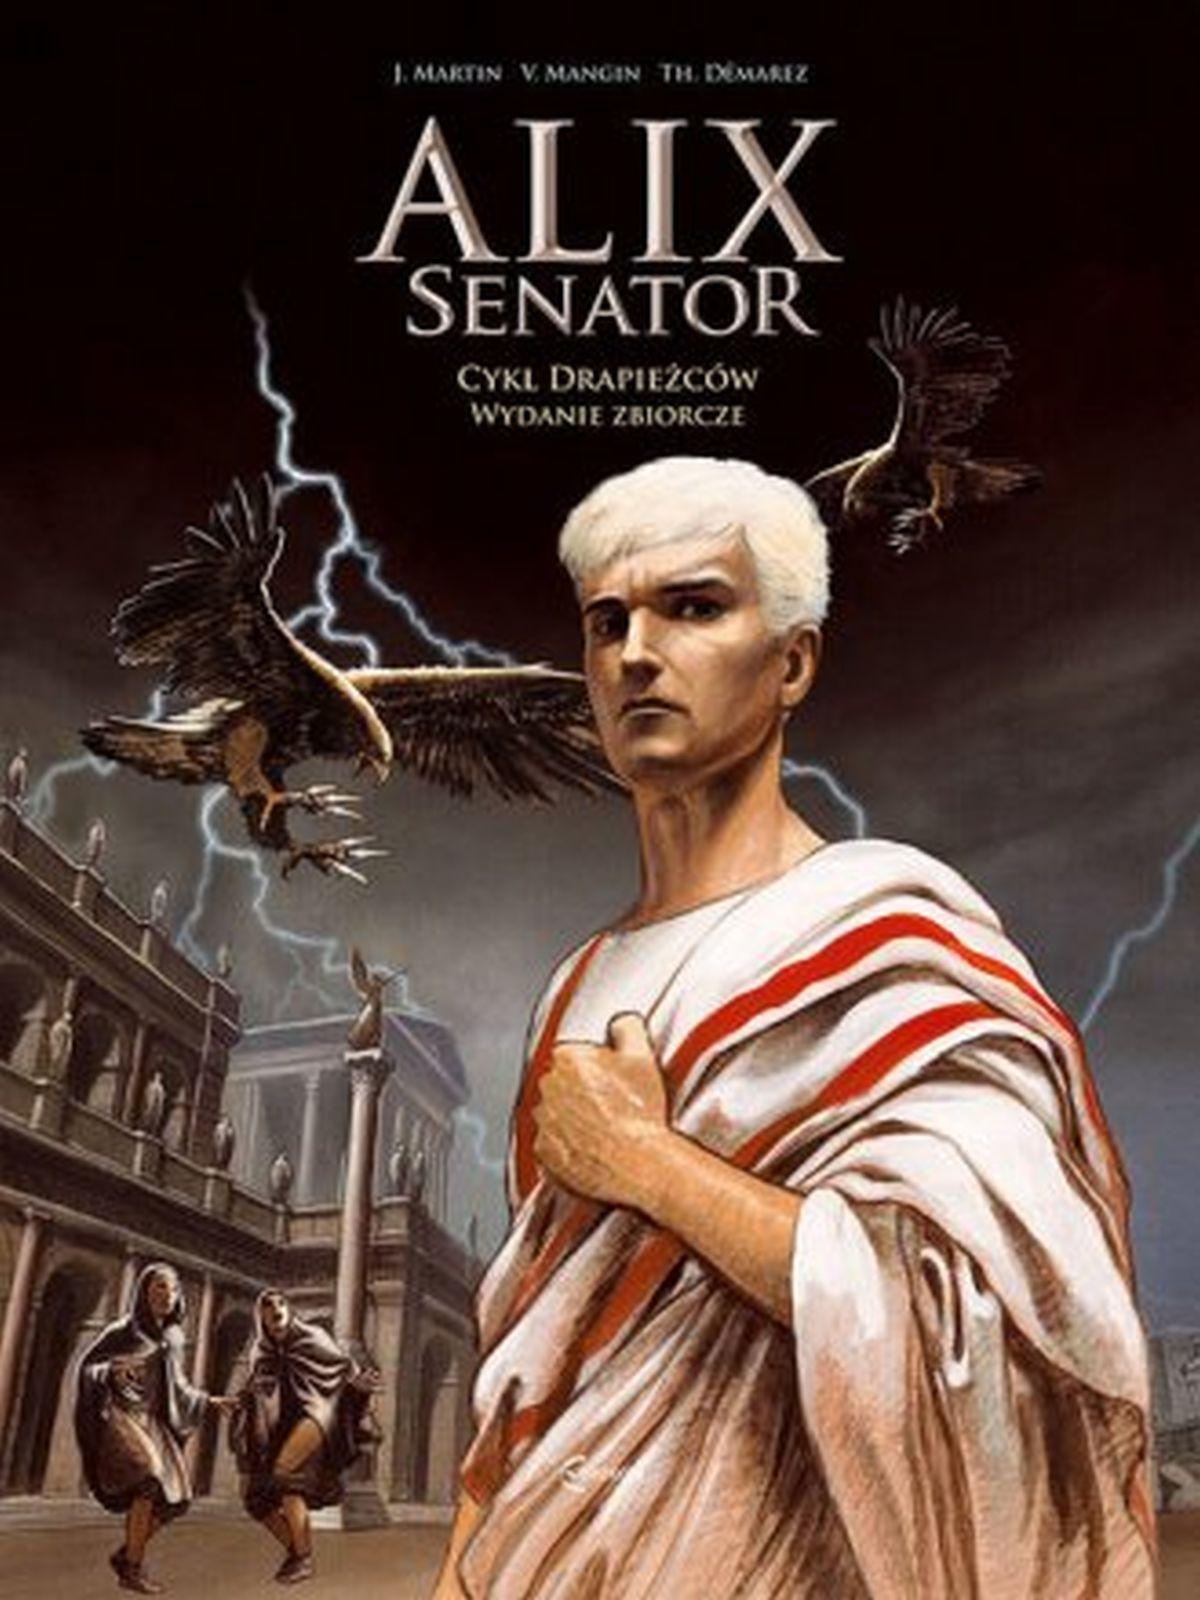 Alix Senator – tom 1 i 2 (Cykl Drapieżców i Kybele)